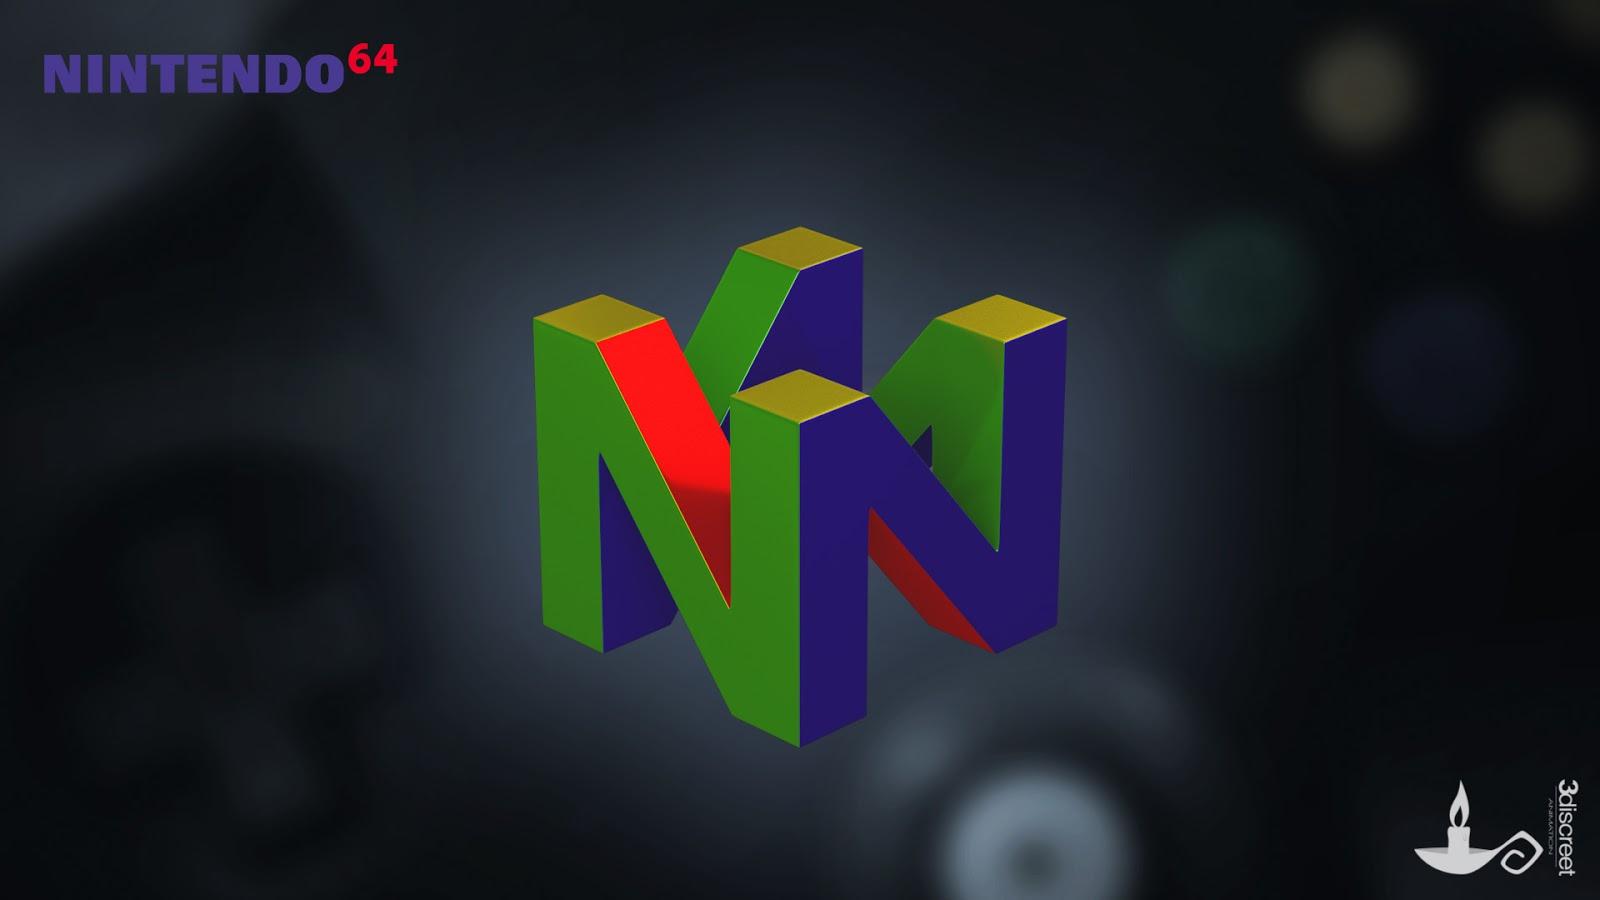 n64 logo hd wallpaper - 1200×630